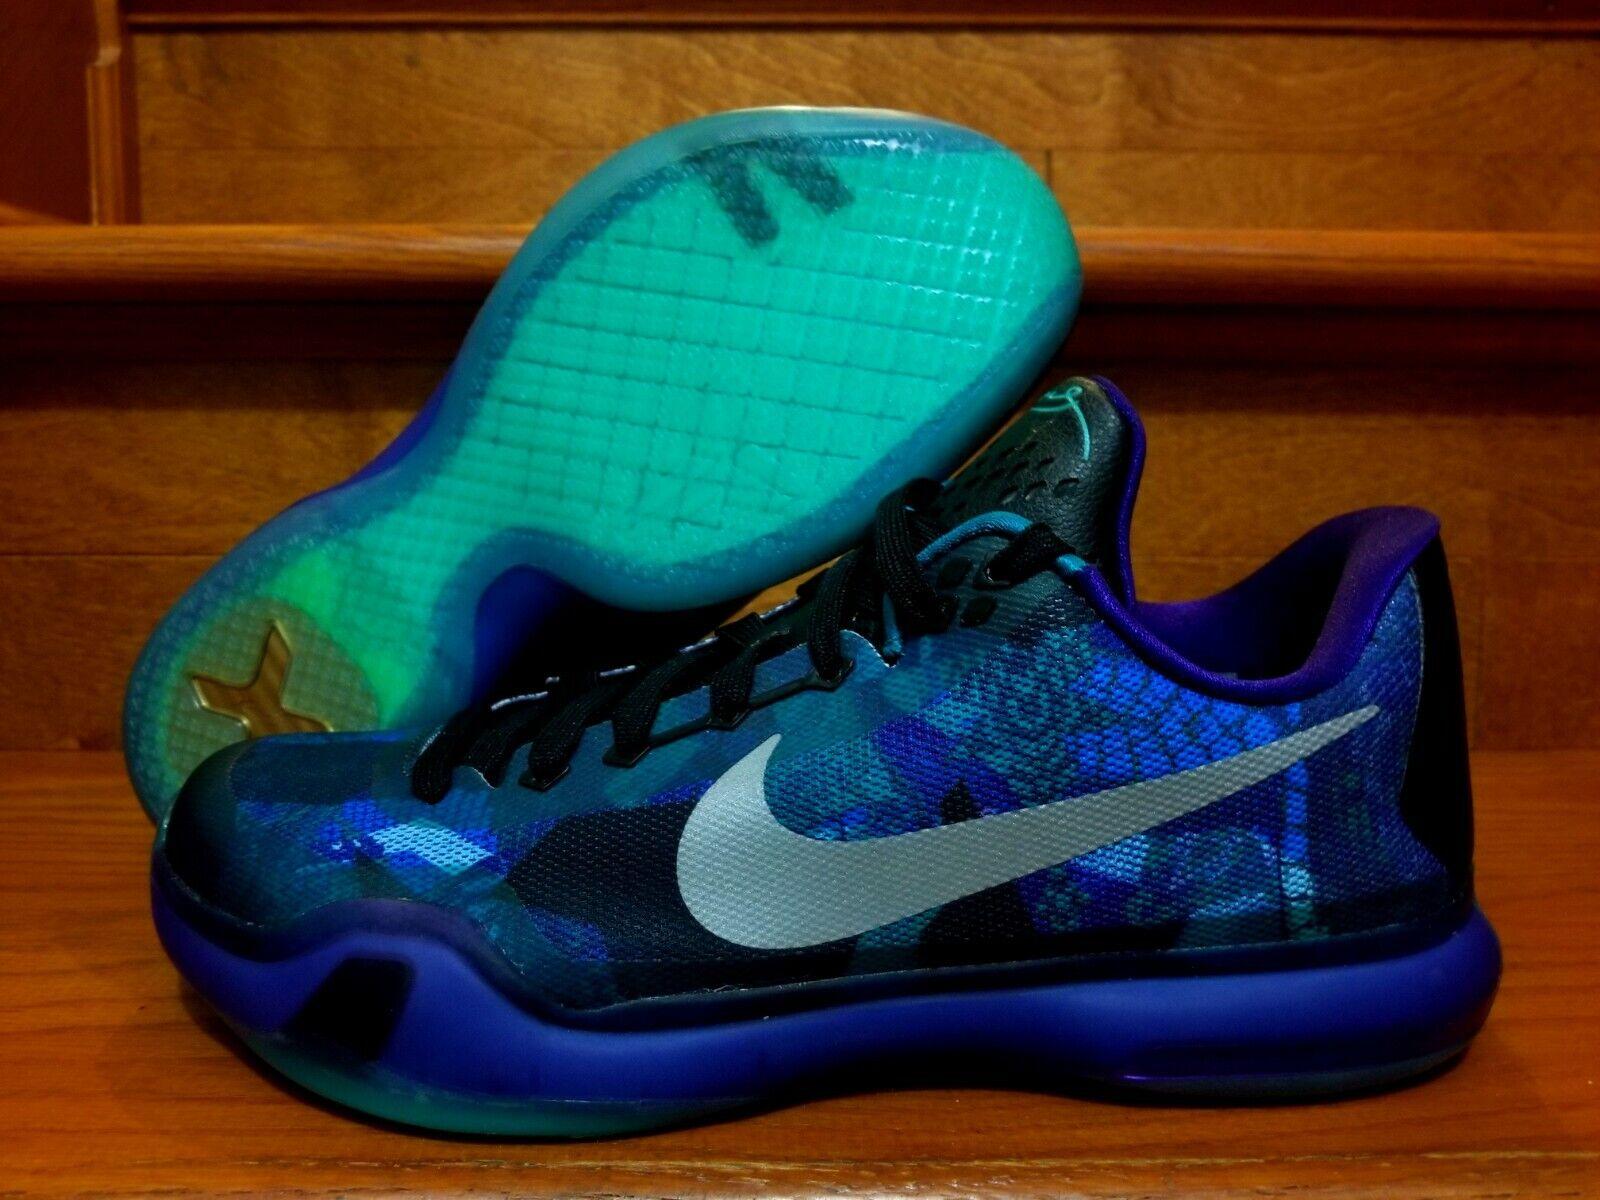 New Mens Nike Kobe X 10 Overcome Peach Jam Emerald Glow Sz 10 (705317 305)